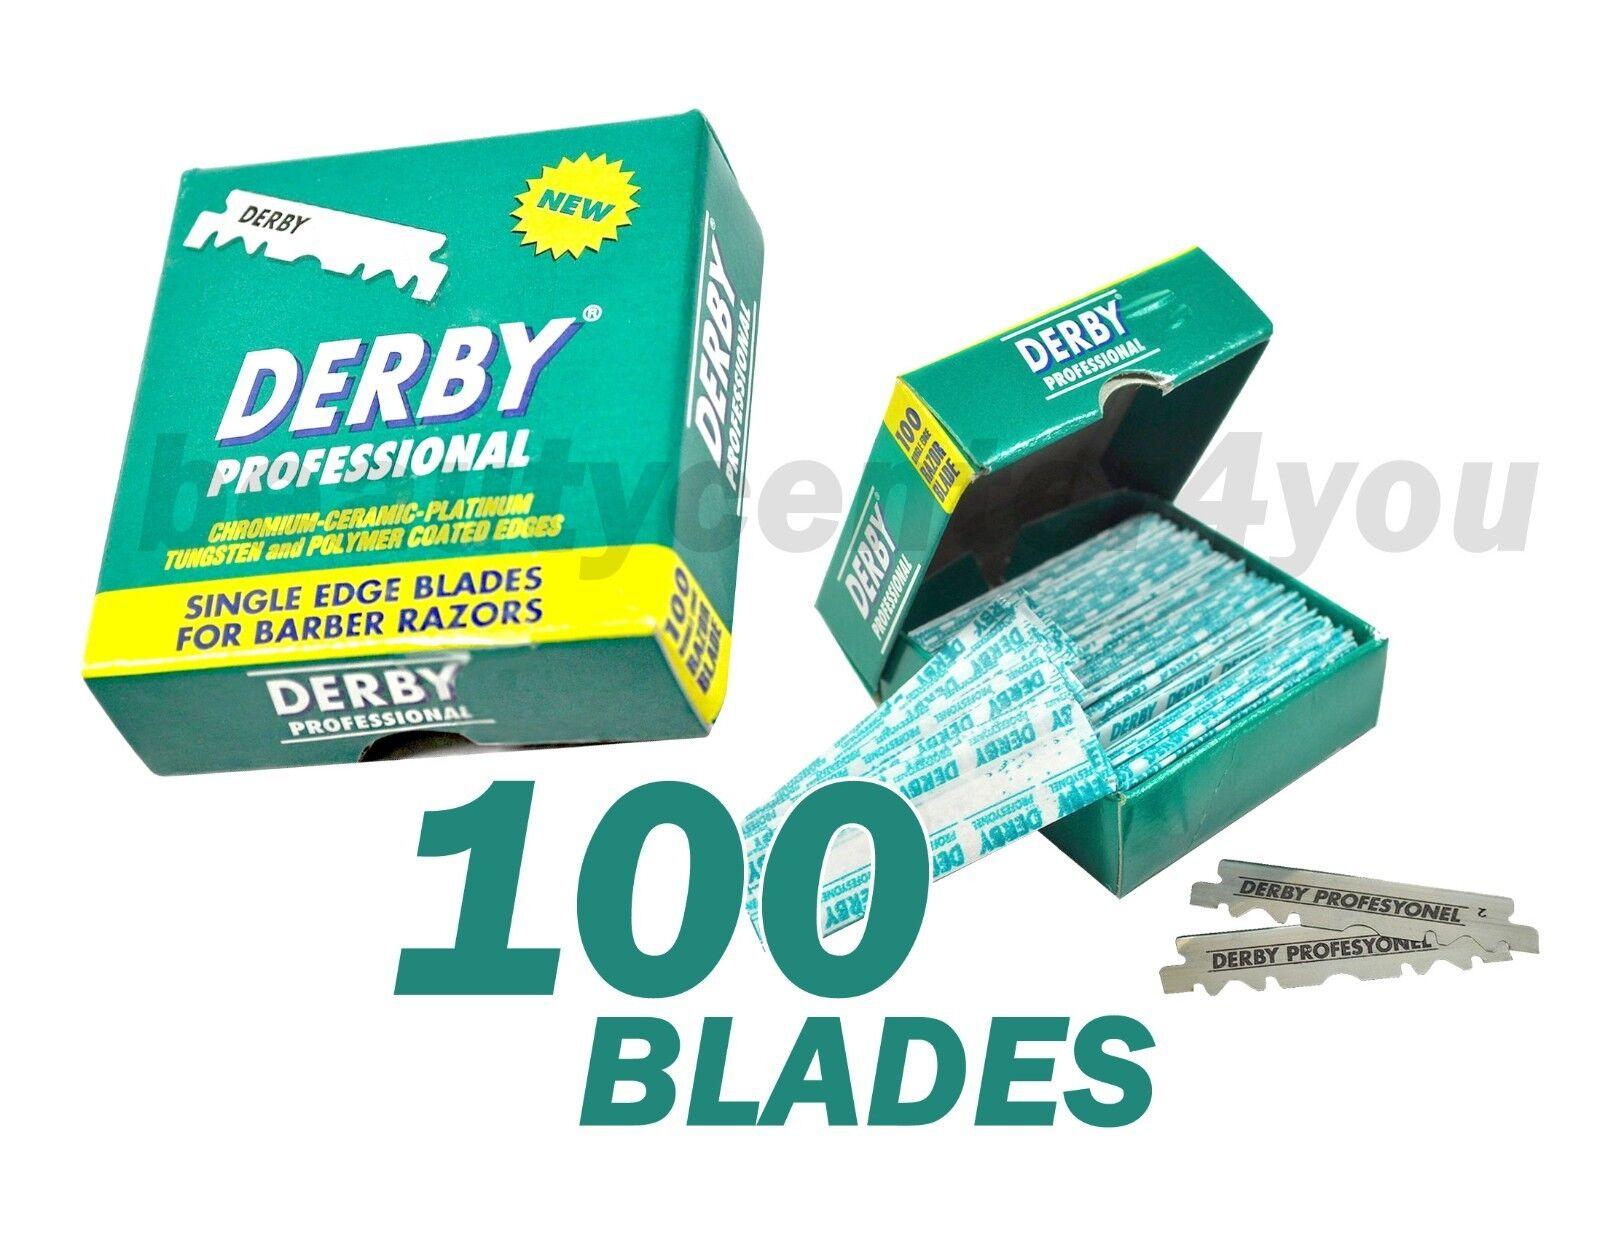 Classic Samurai CS-102 Stainless Straight Edge Barber Razor +100 Derby Blades